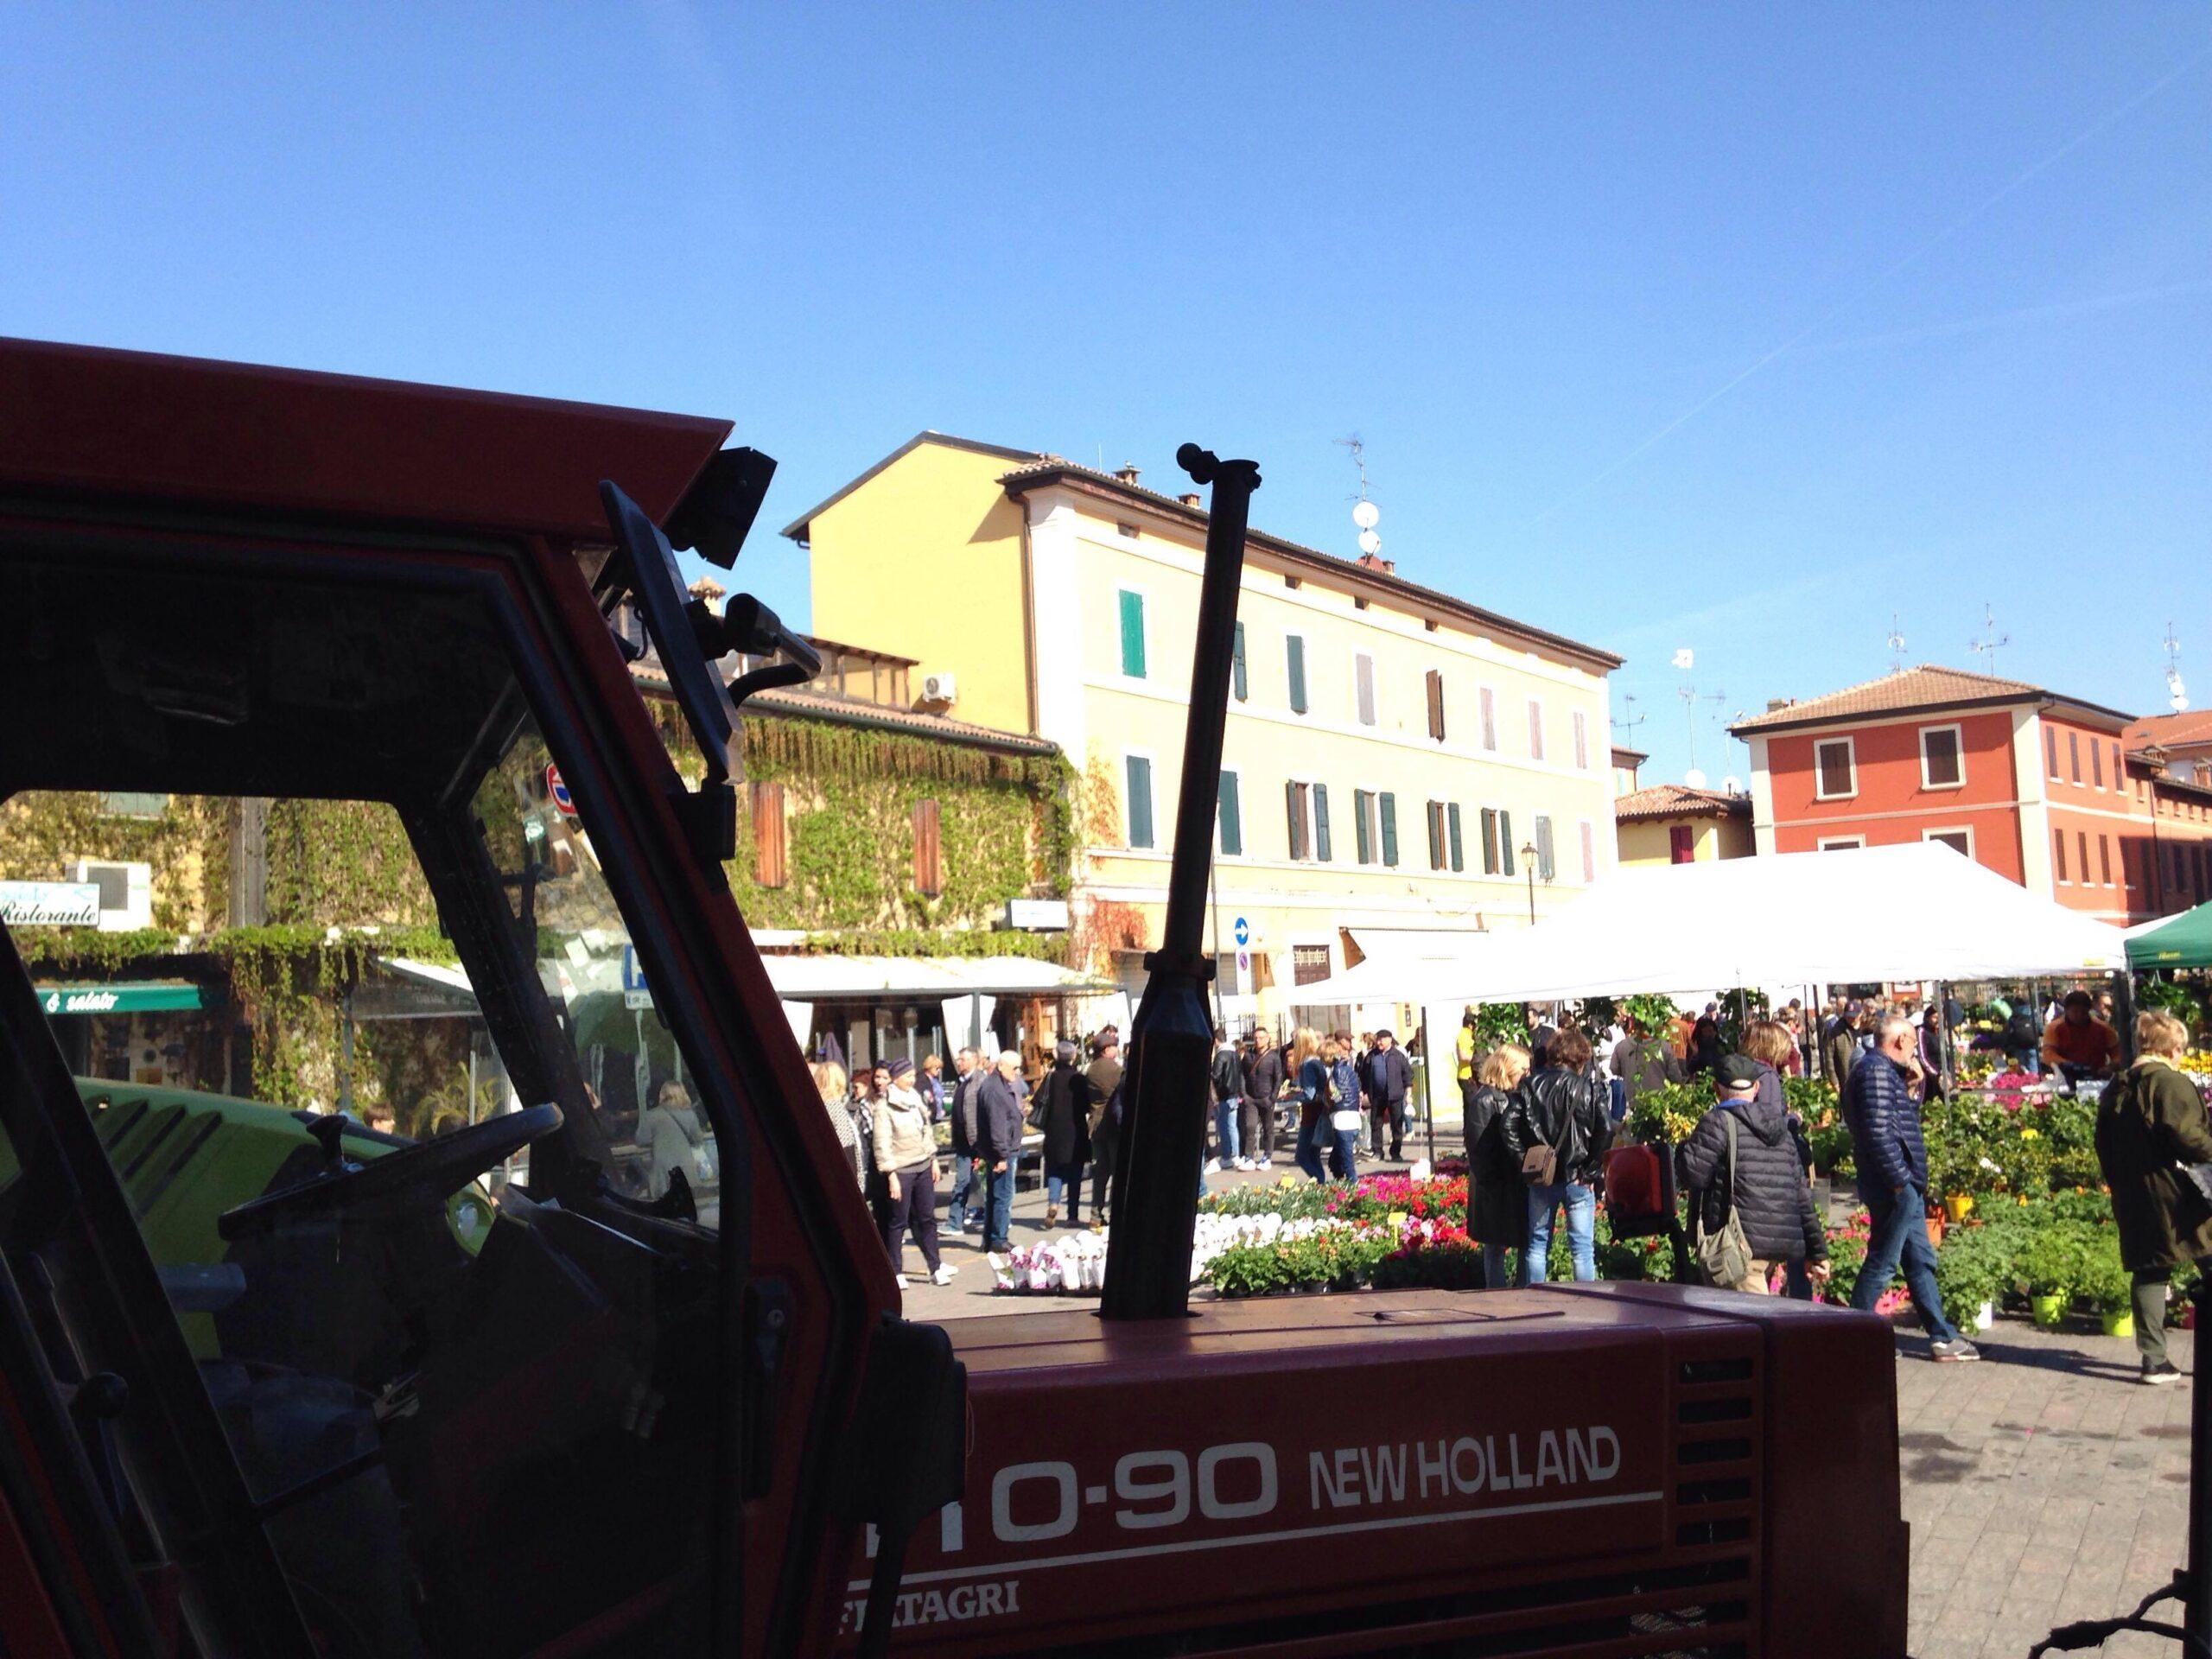 http://prolocosanpietroincasale.it/wp-content/uploads/2021/06/trattori-scaled.jpg